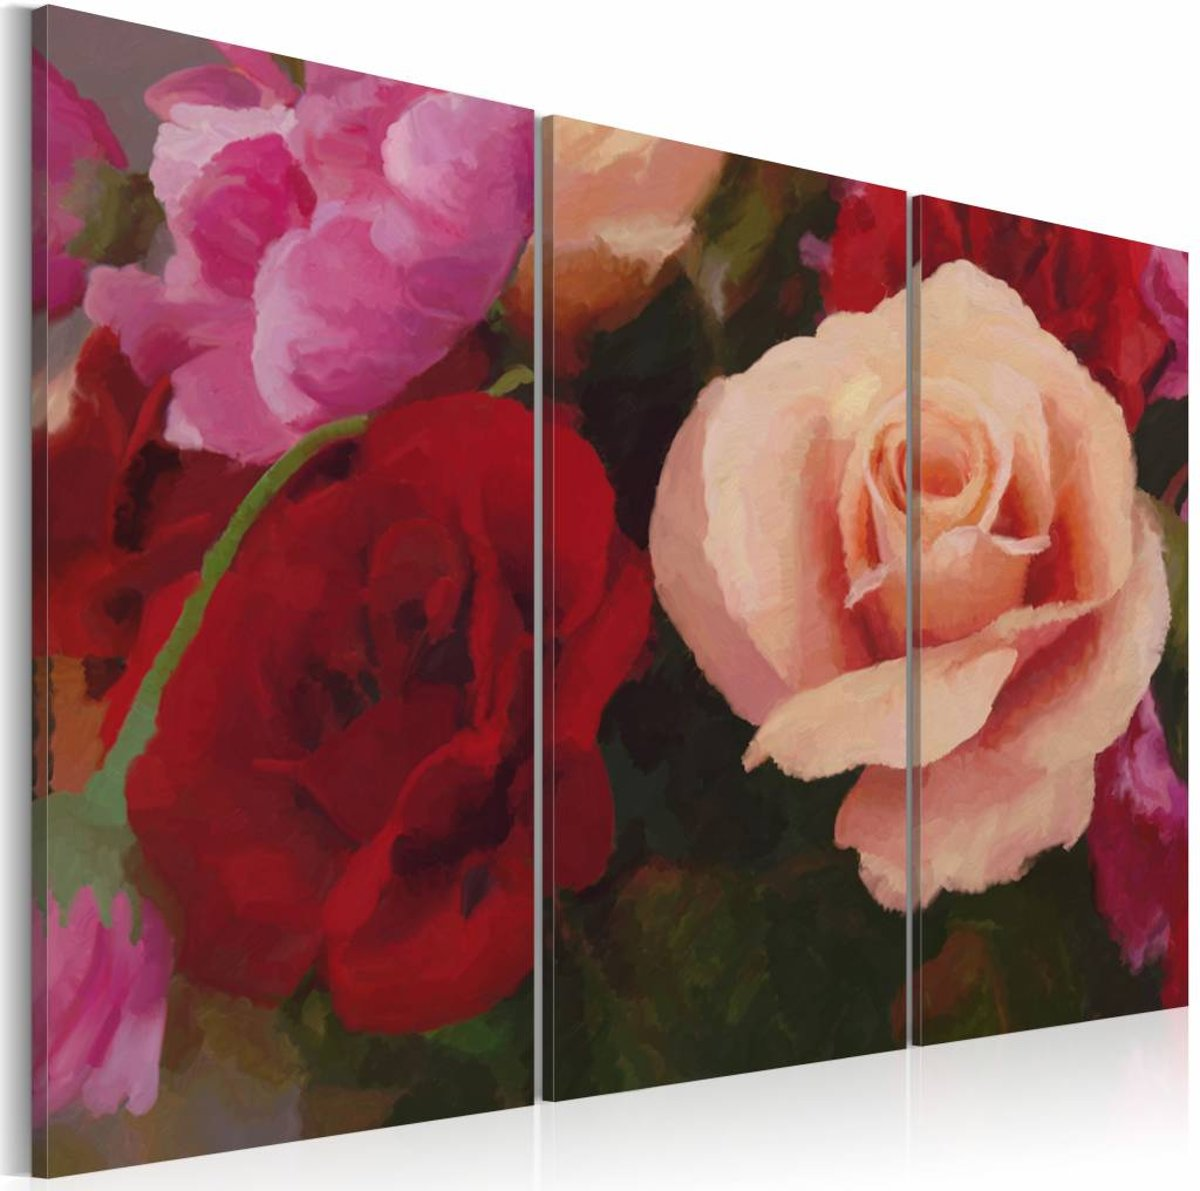 Schilderij - Perfect in every inch - 120x80